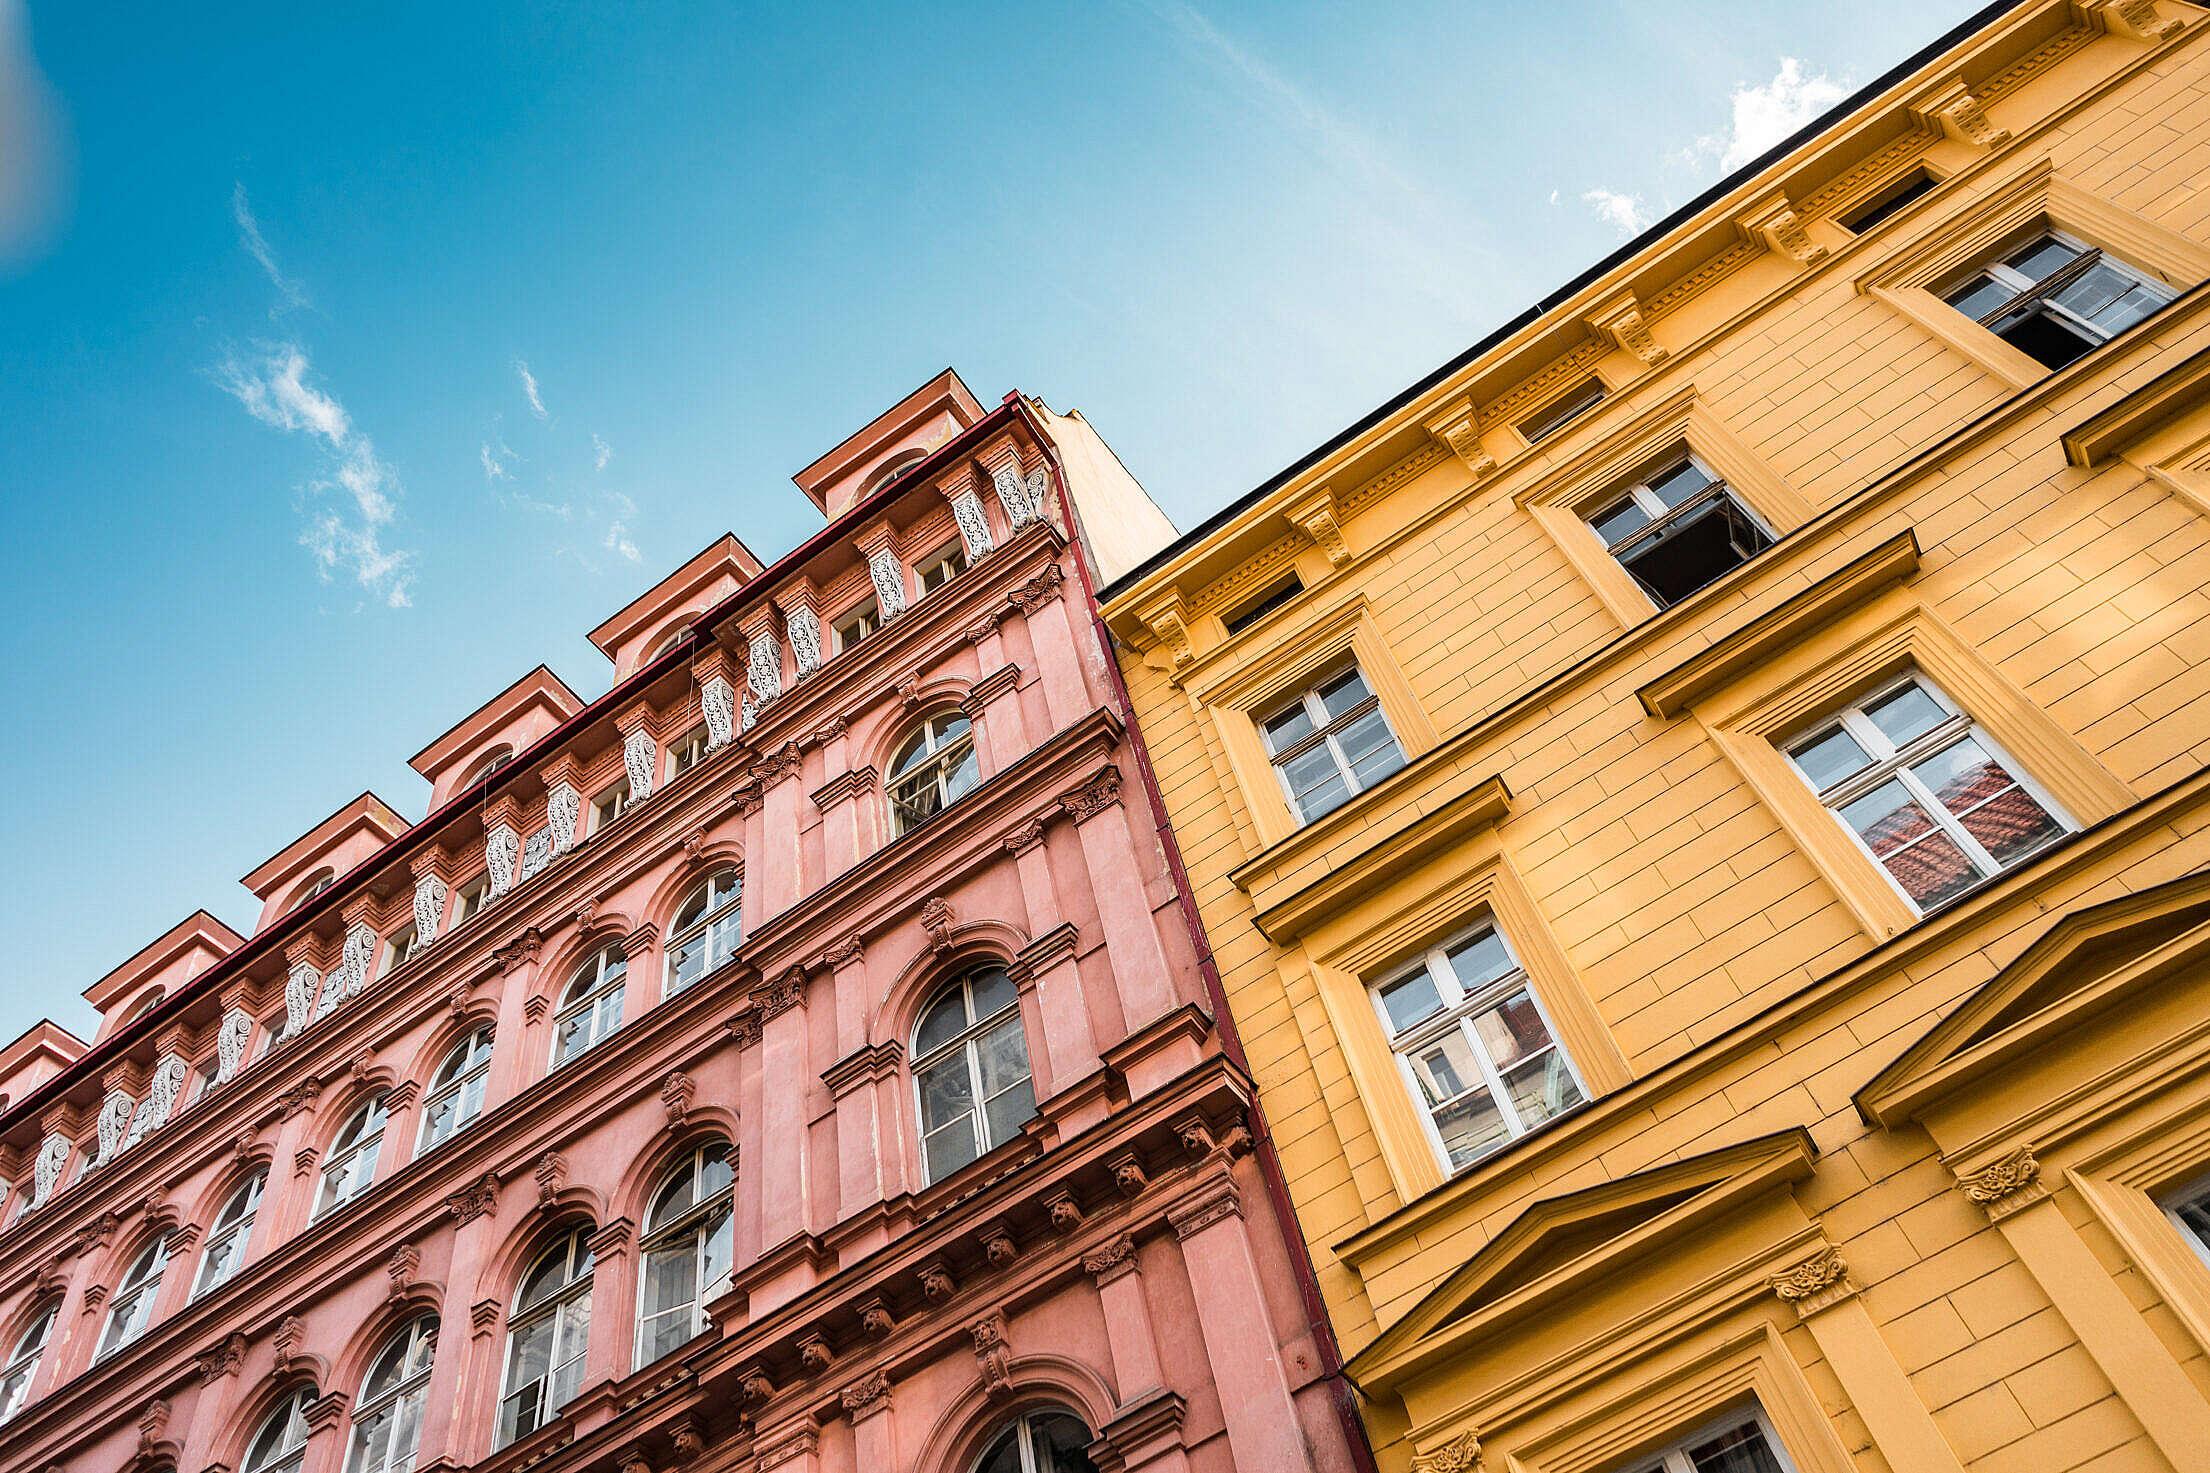 Random Buildings in Prague, Czechia Free Stock Photo